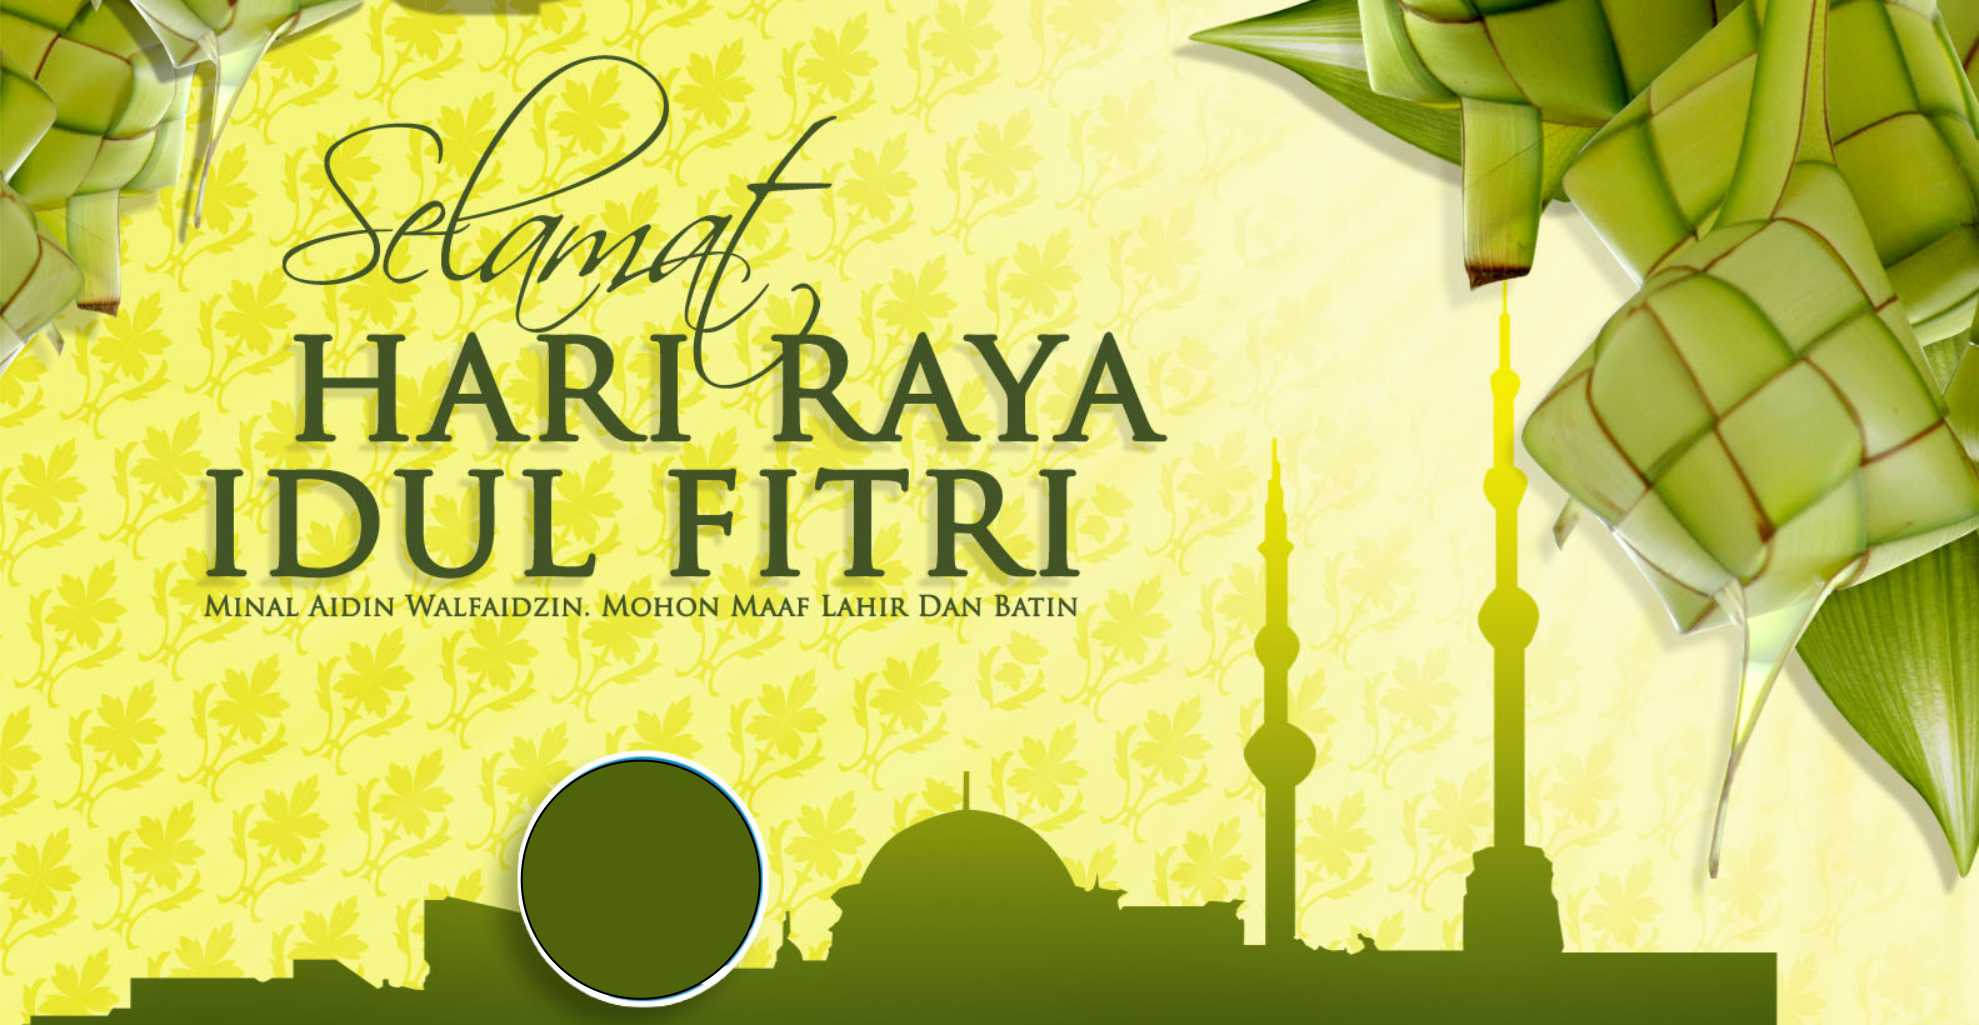 Amalan Hari Raya Hari Raya Idul Fitri Kicaunews